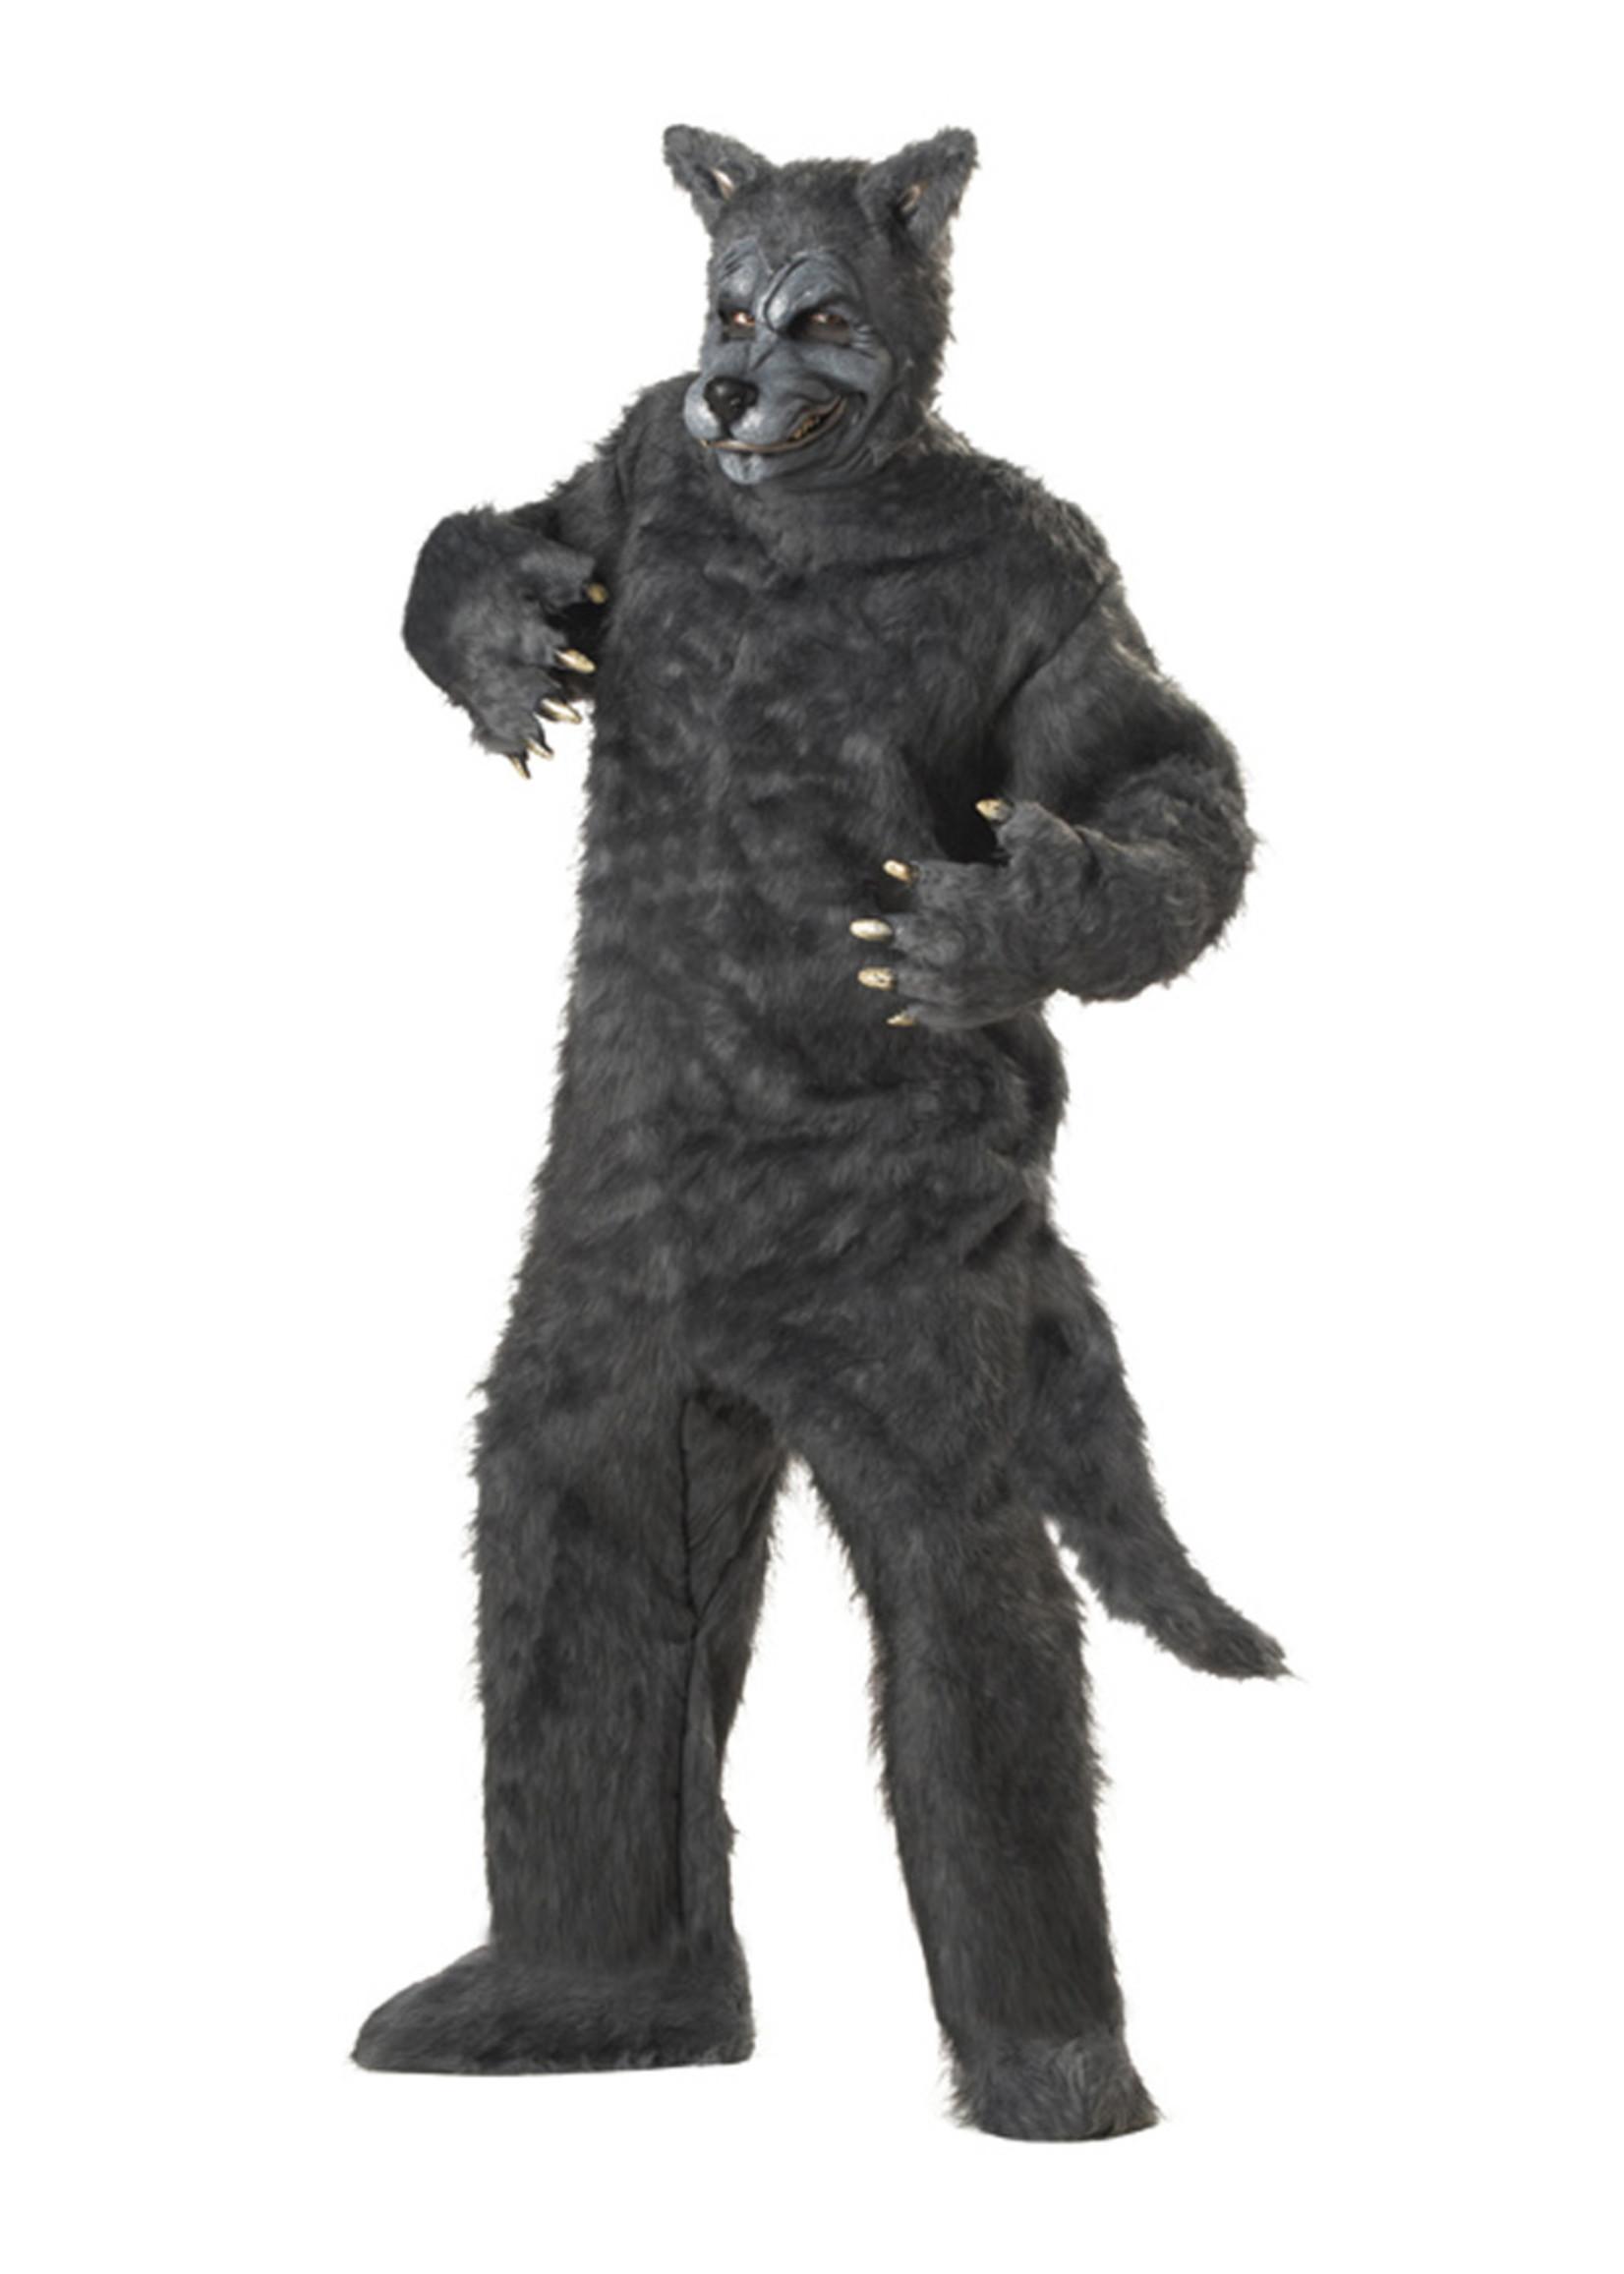 Big Bad Wolf Costume - Humor